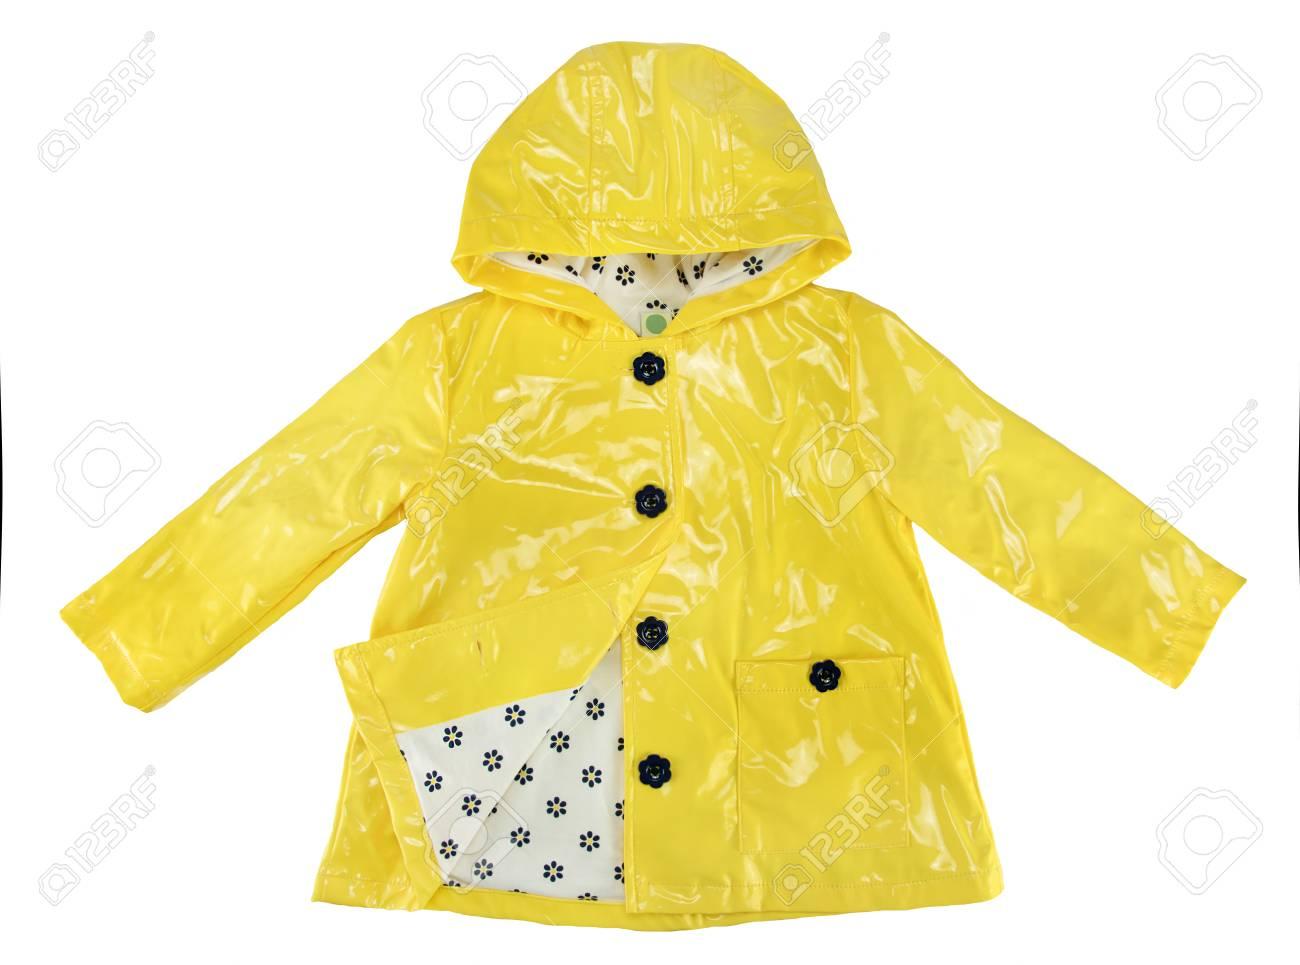 Elegance rain jacket yellow for girl - 98690374